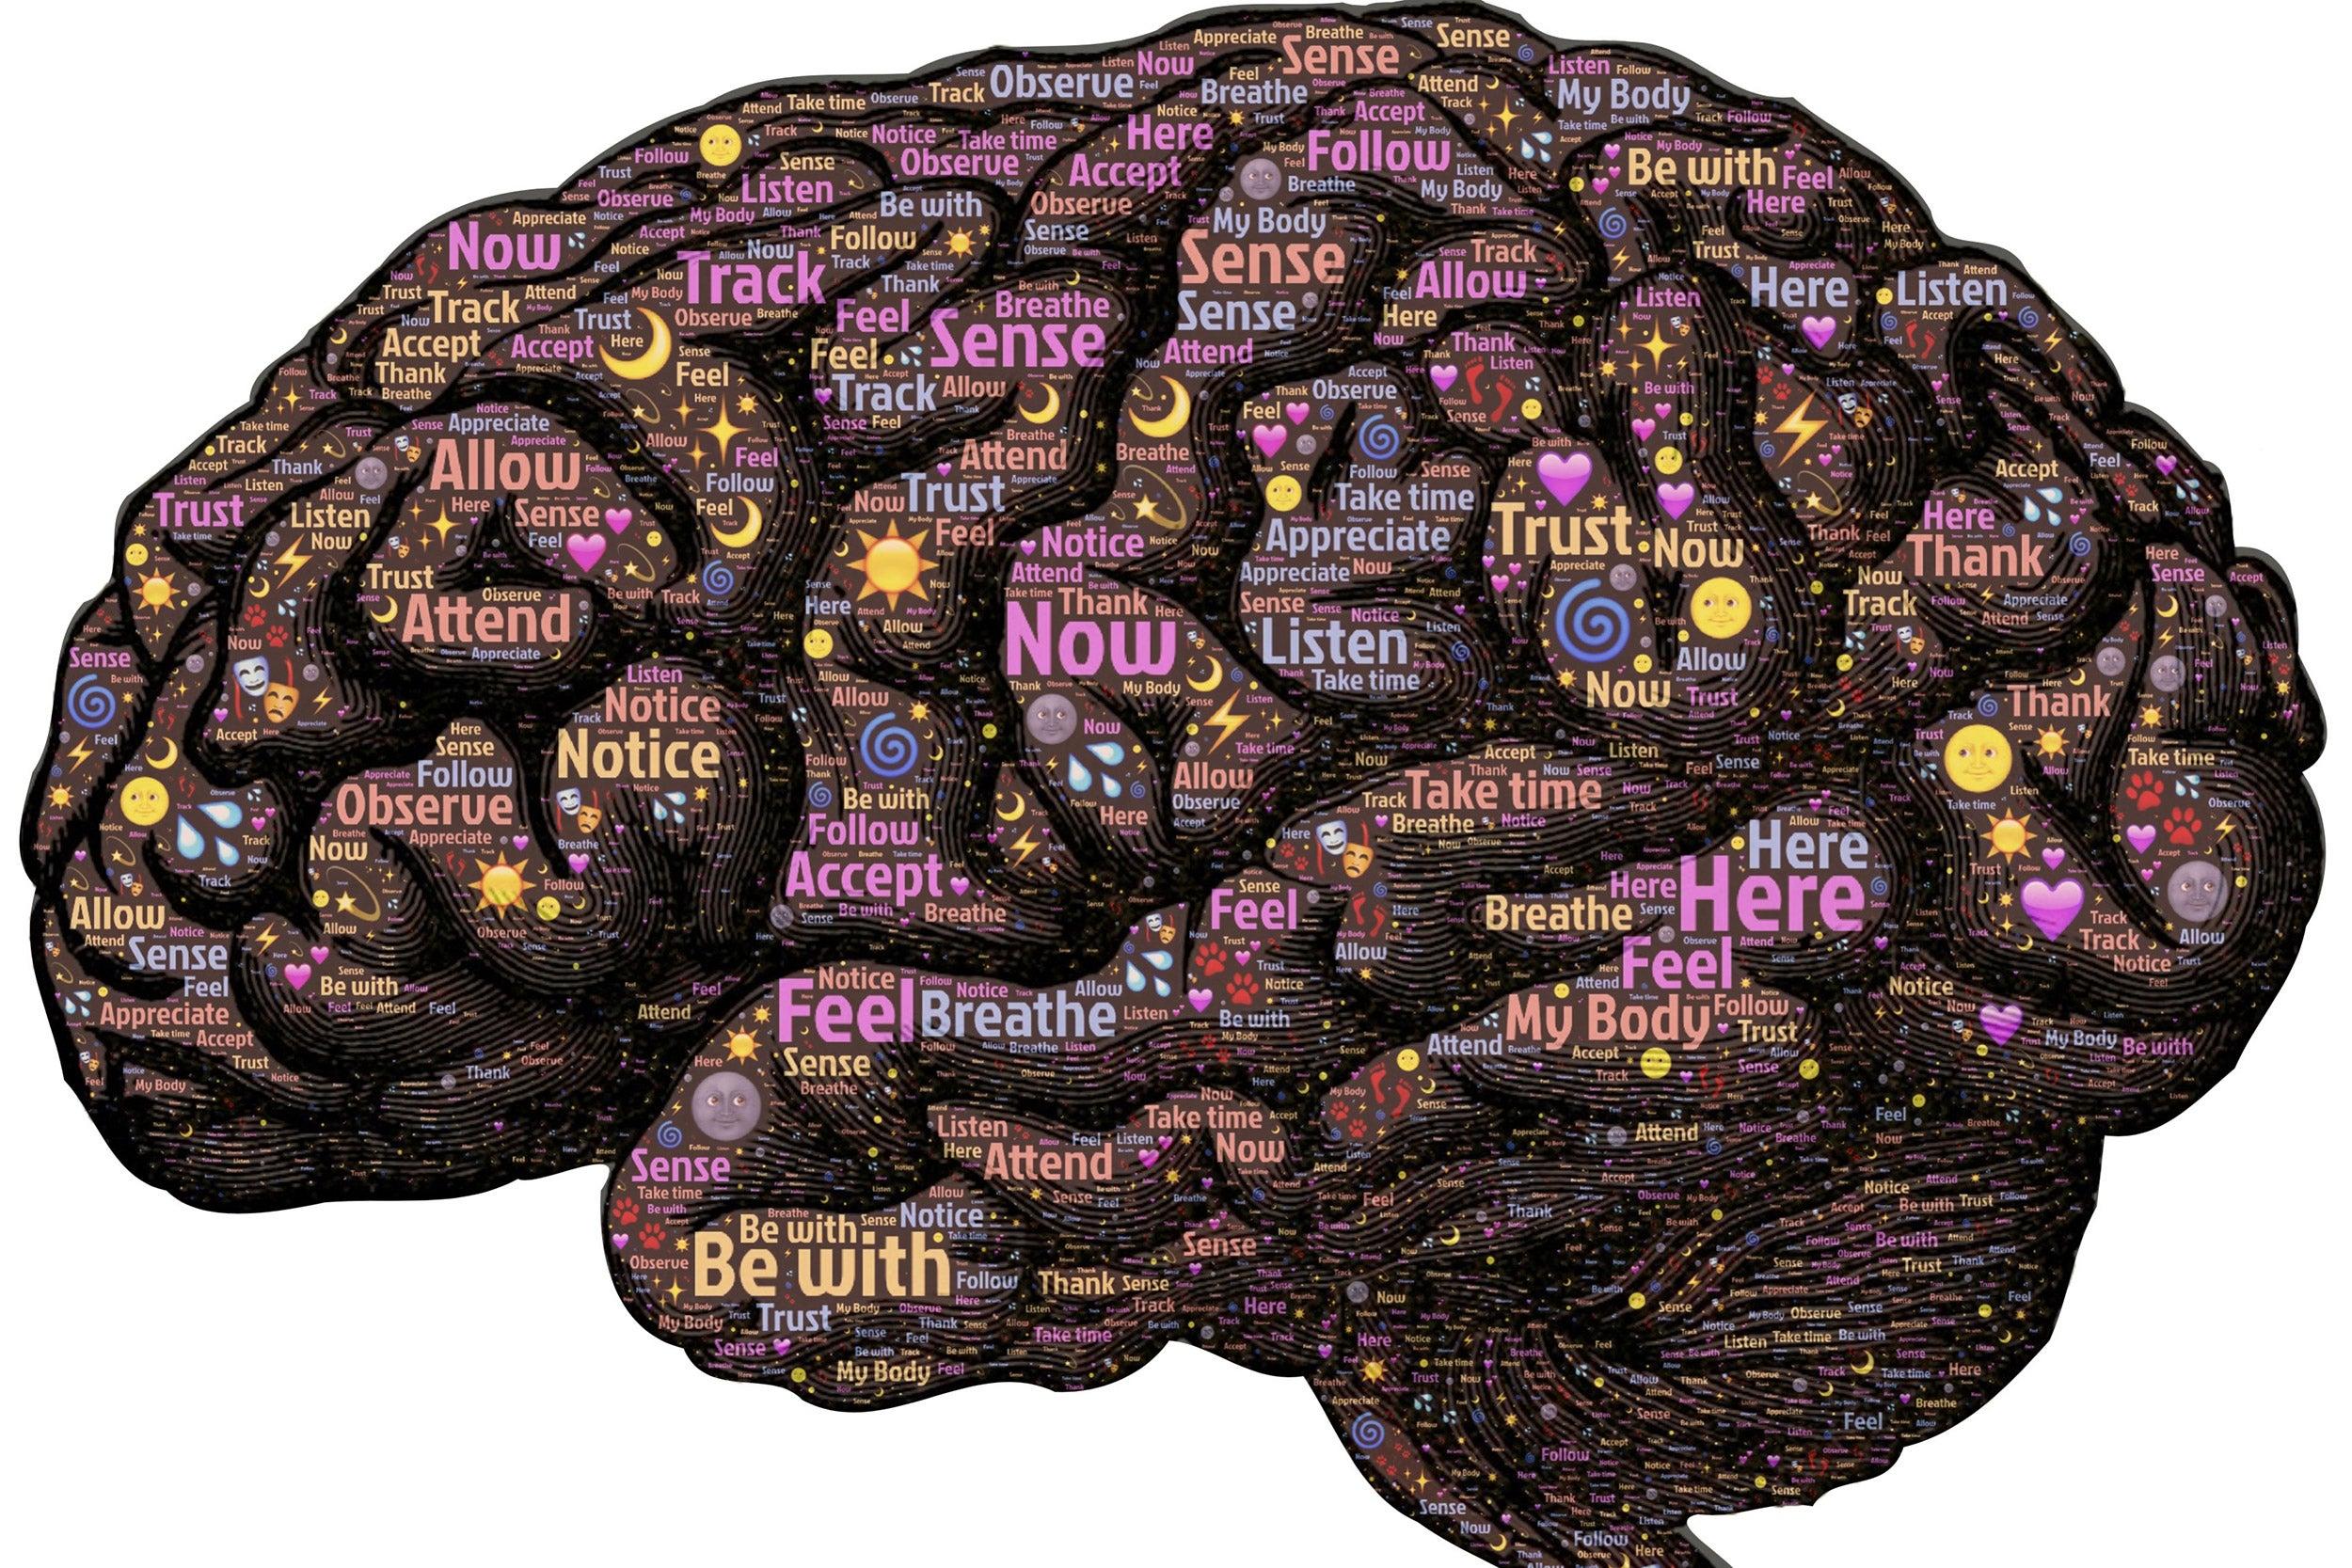 graphic of brain